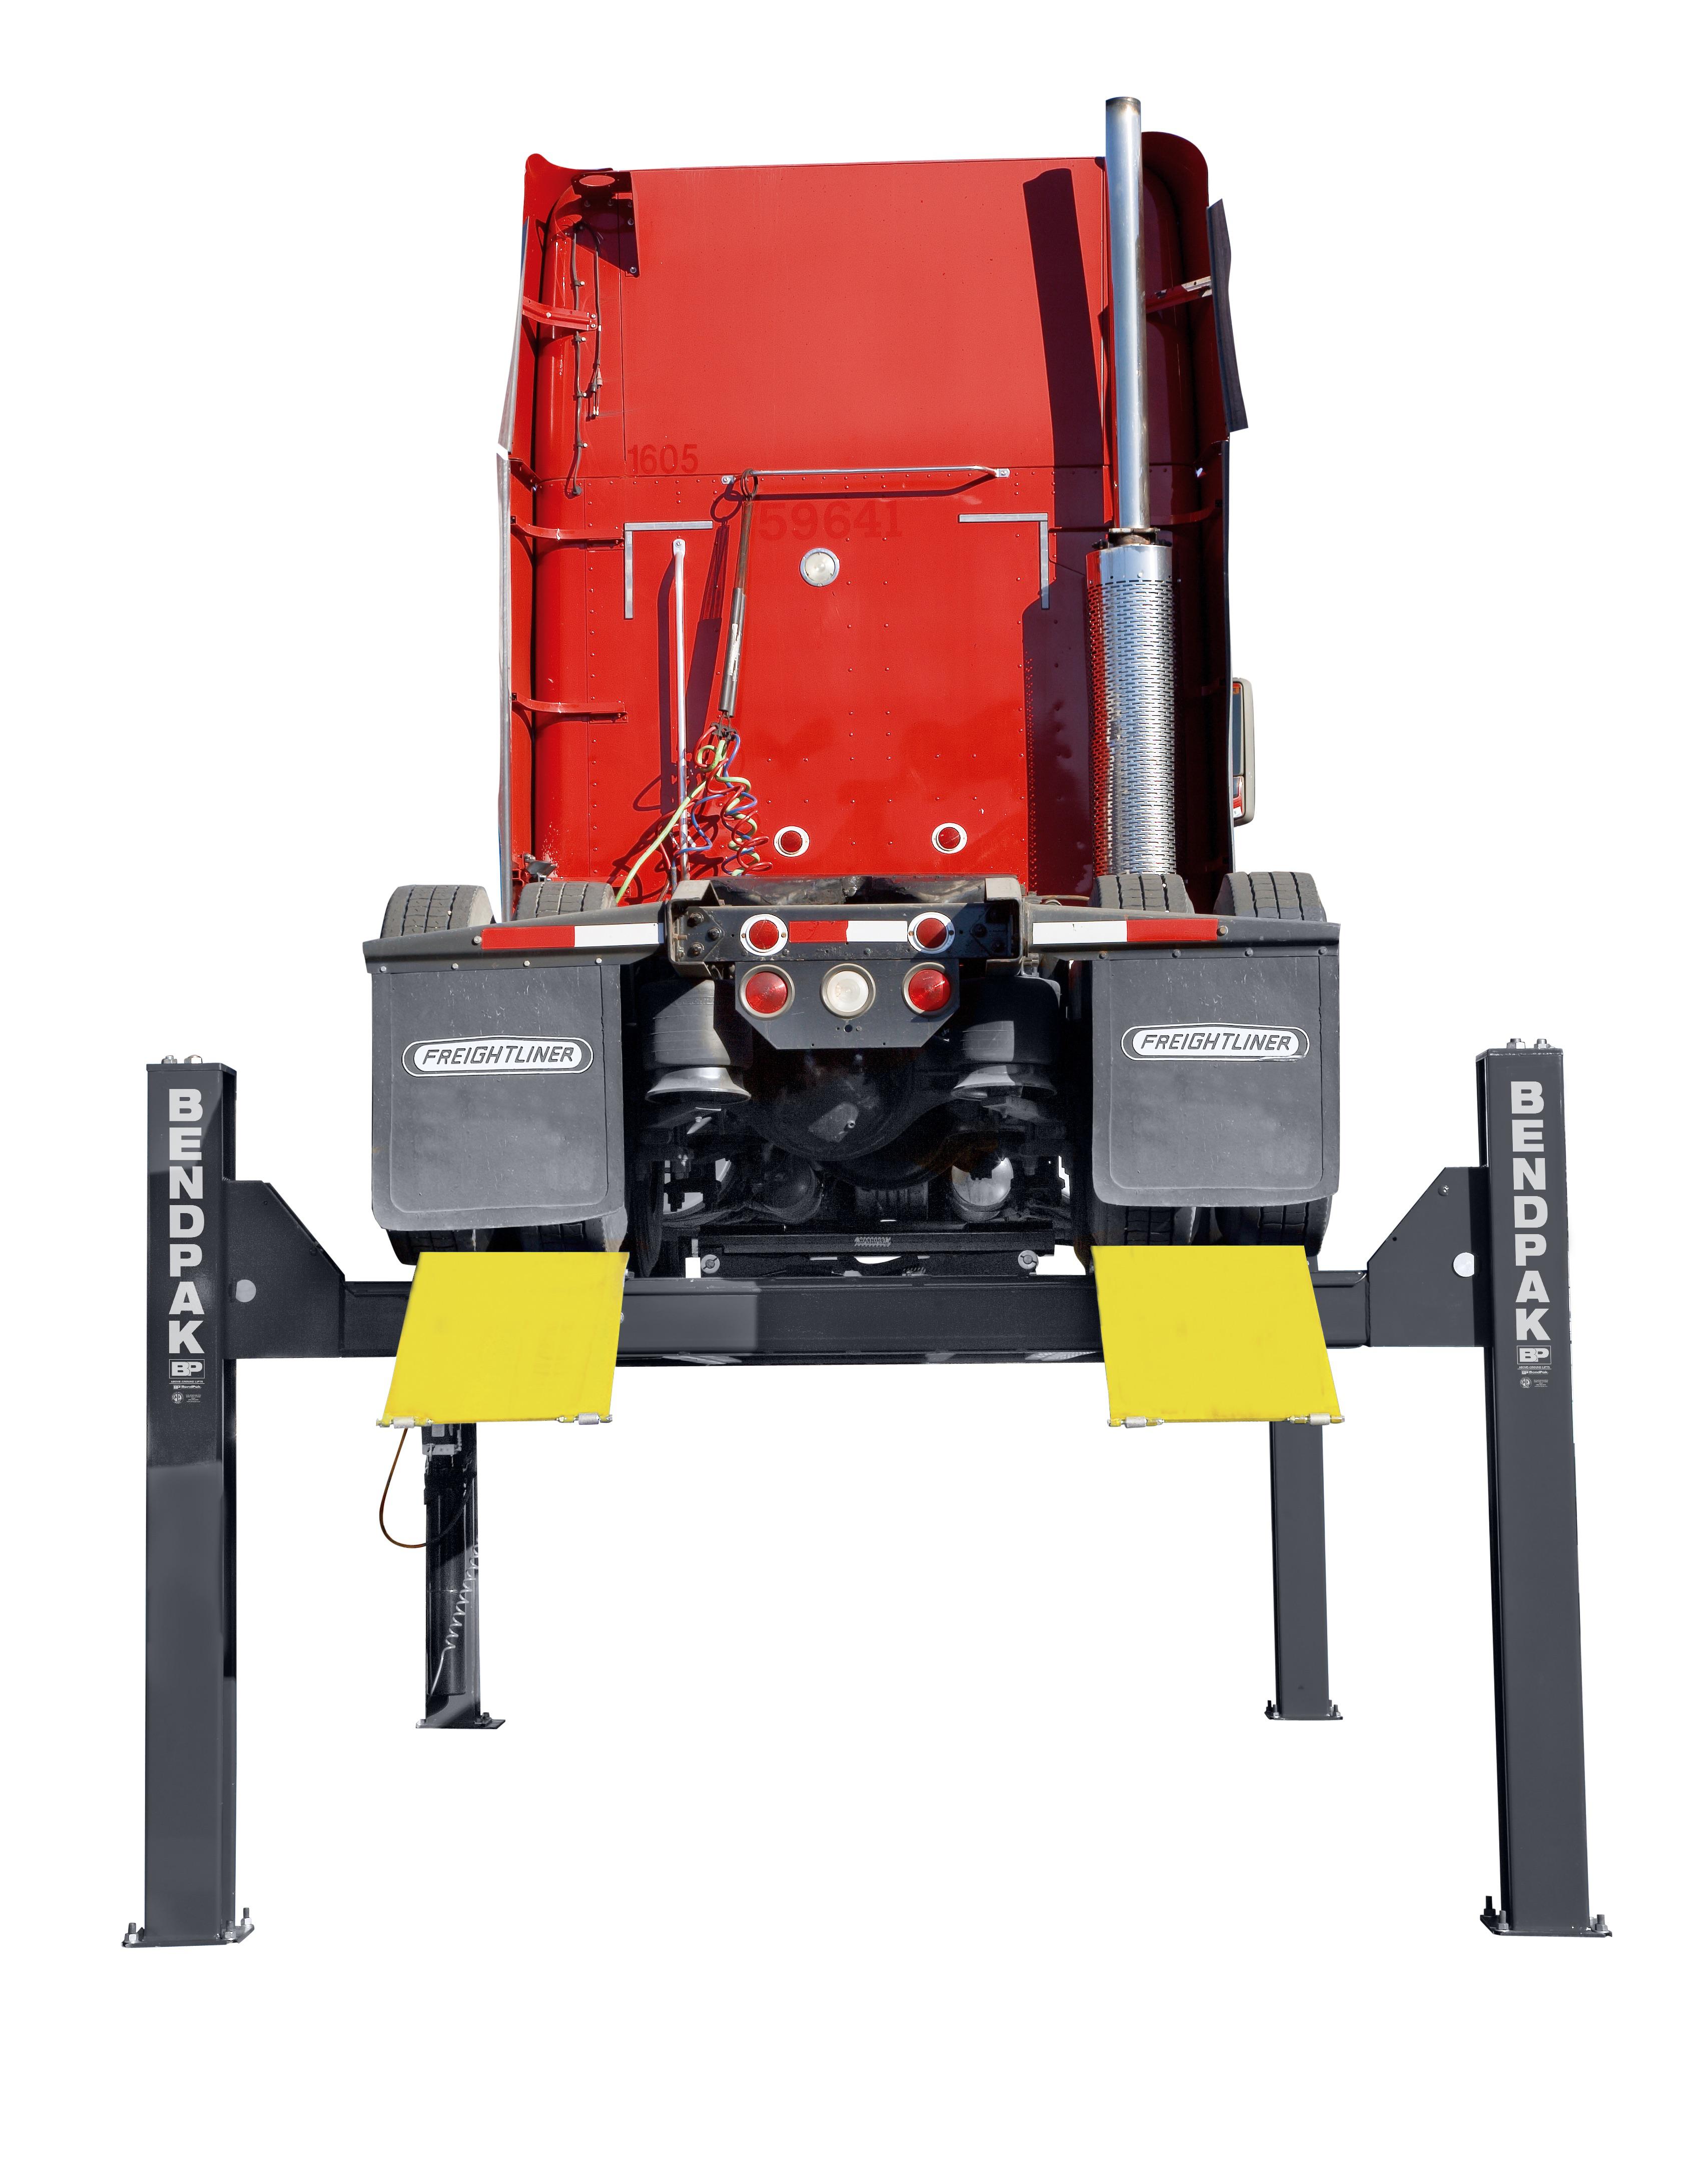 BendPak HDS-35 four-post lift